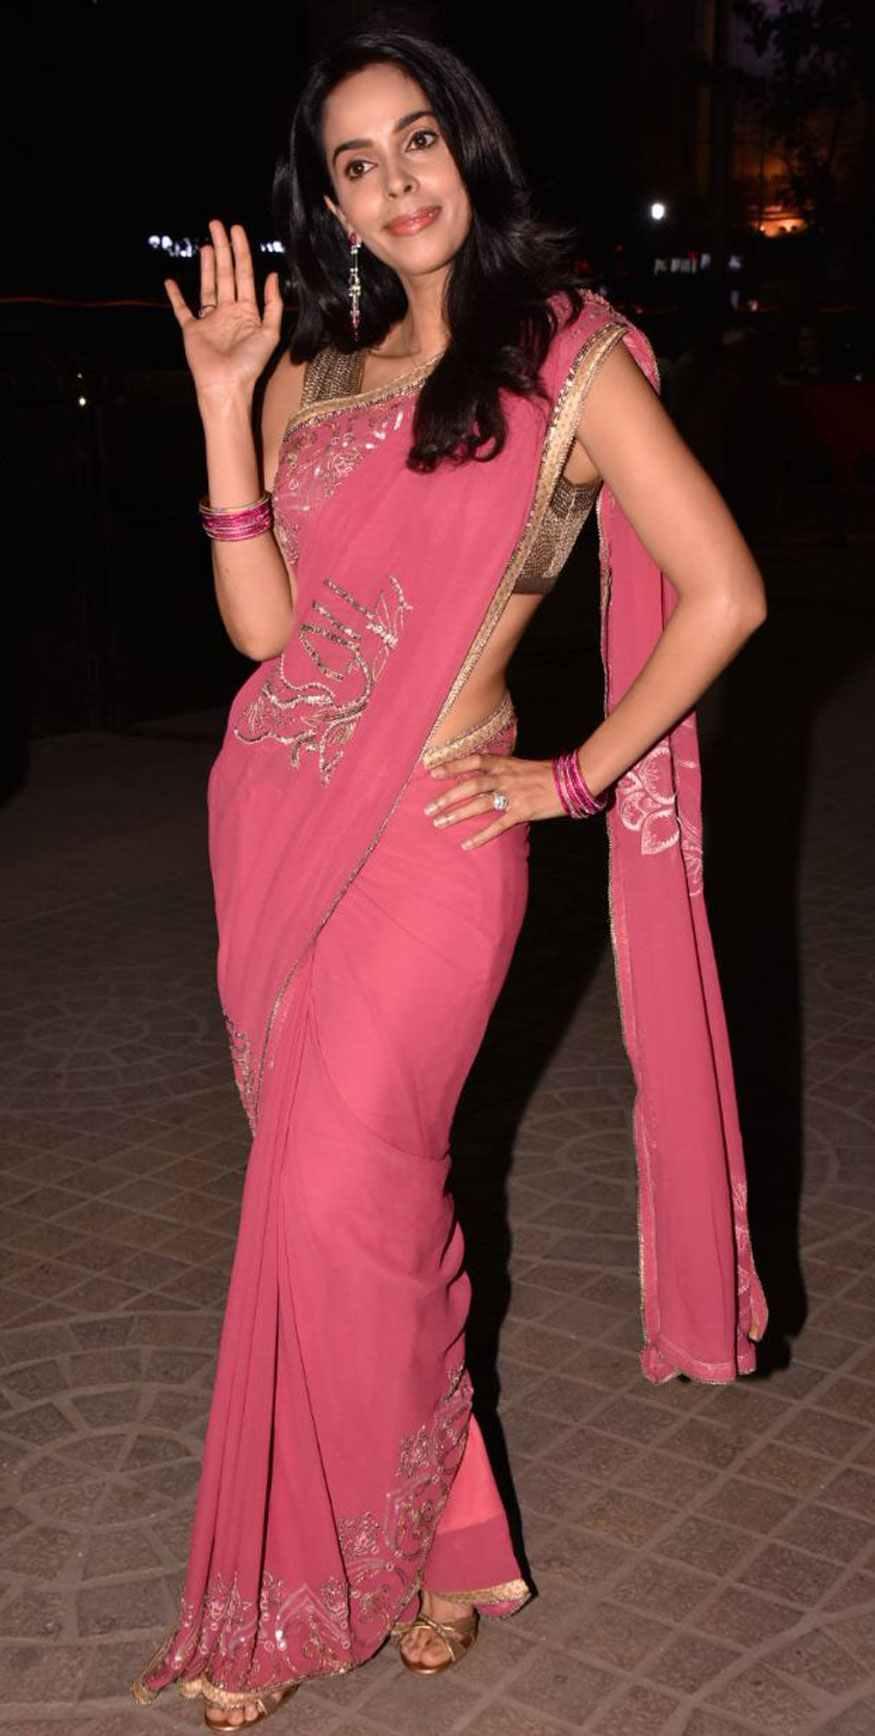 Mallika Sherawat nudes (52 photo), Topless, Paparazzi, Feet, legs 2020